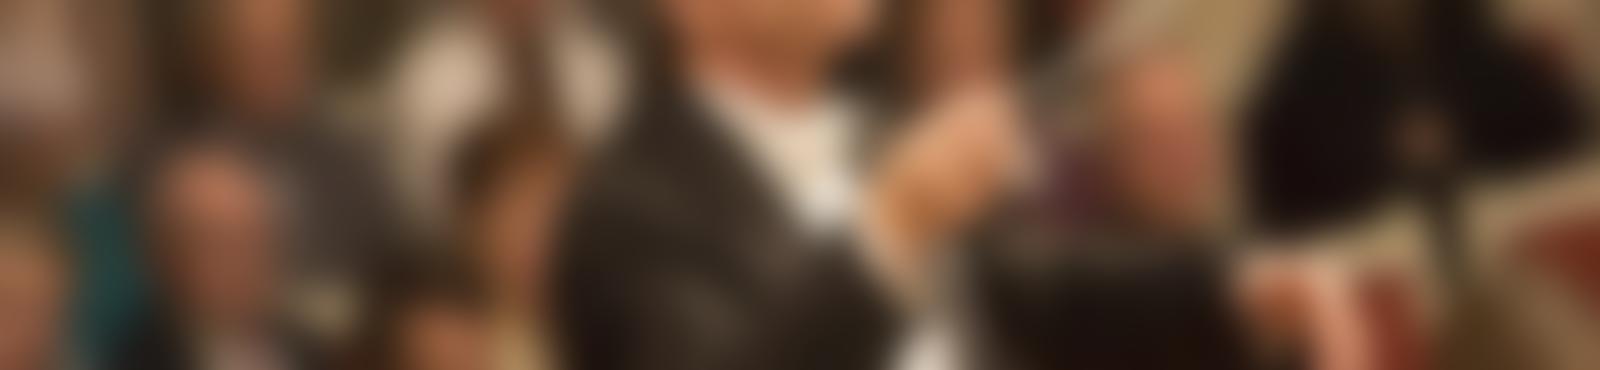 Blurred ac436be5 5381 419c 9920 31b5655ba9f3